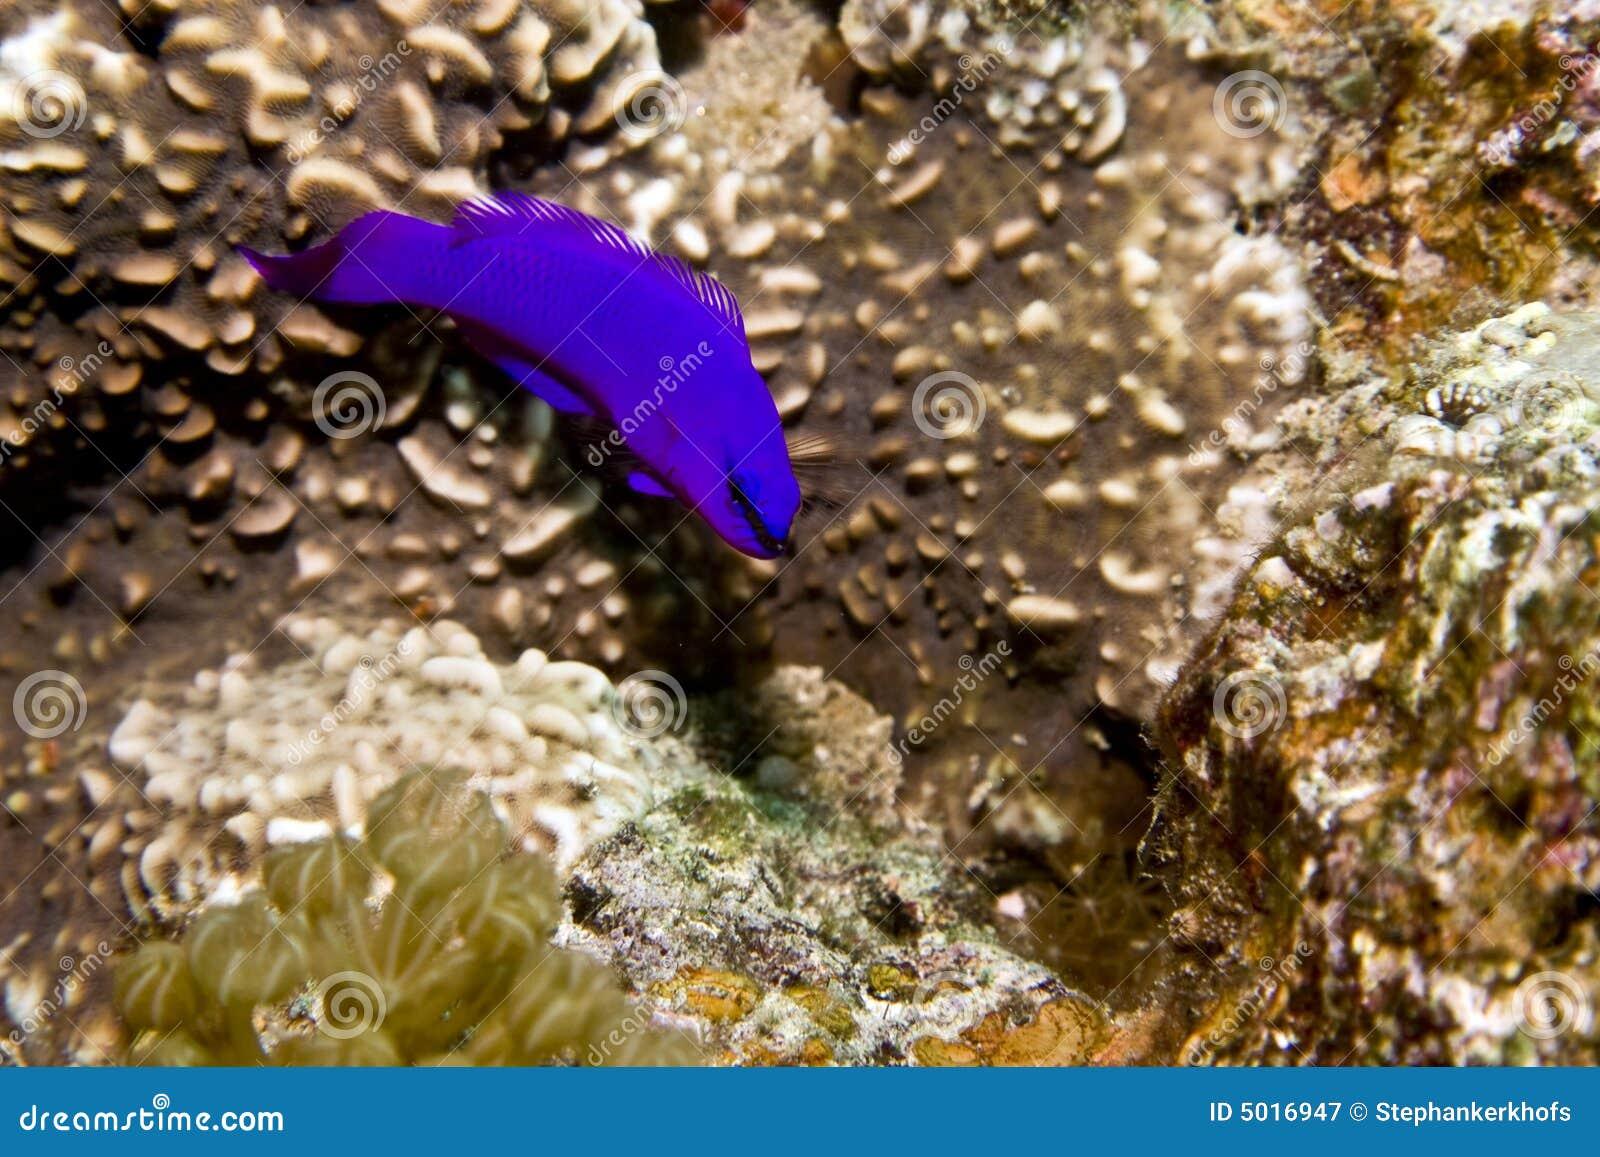 Orchid dottyback (pseudochromis fridmani)